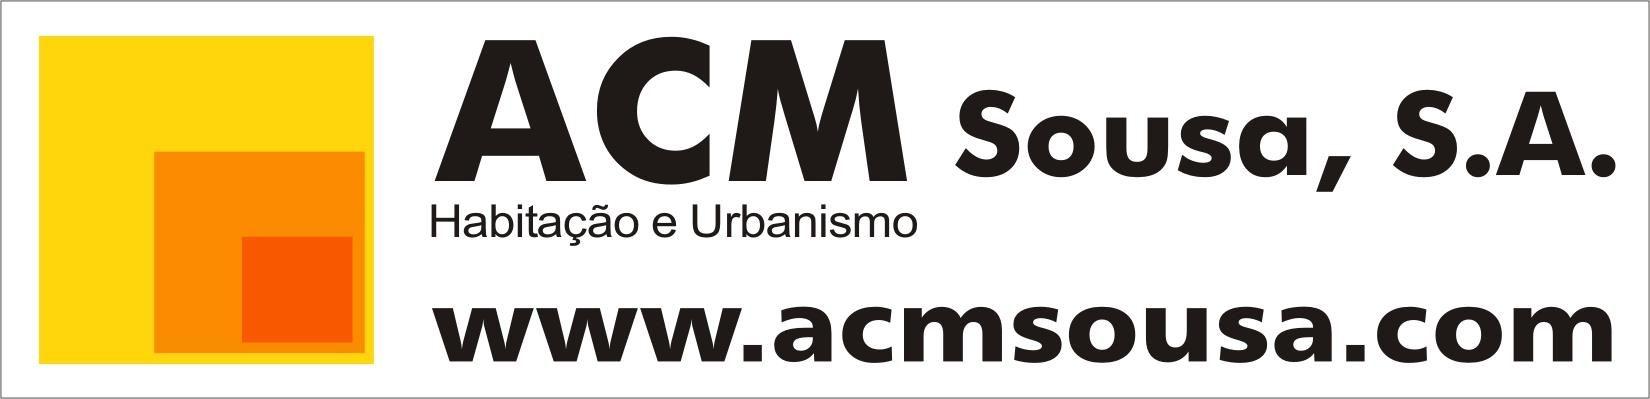 ACMSousa, S.A.